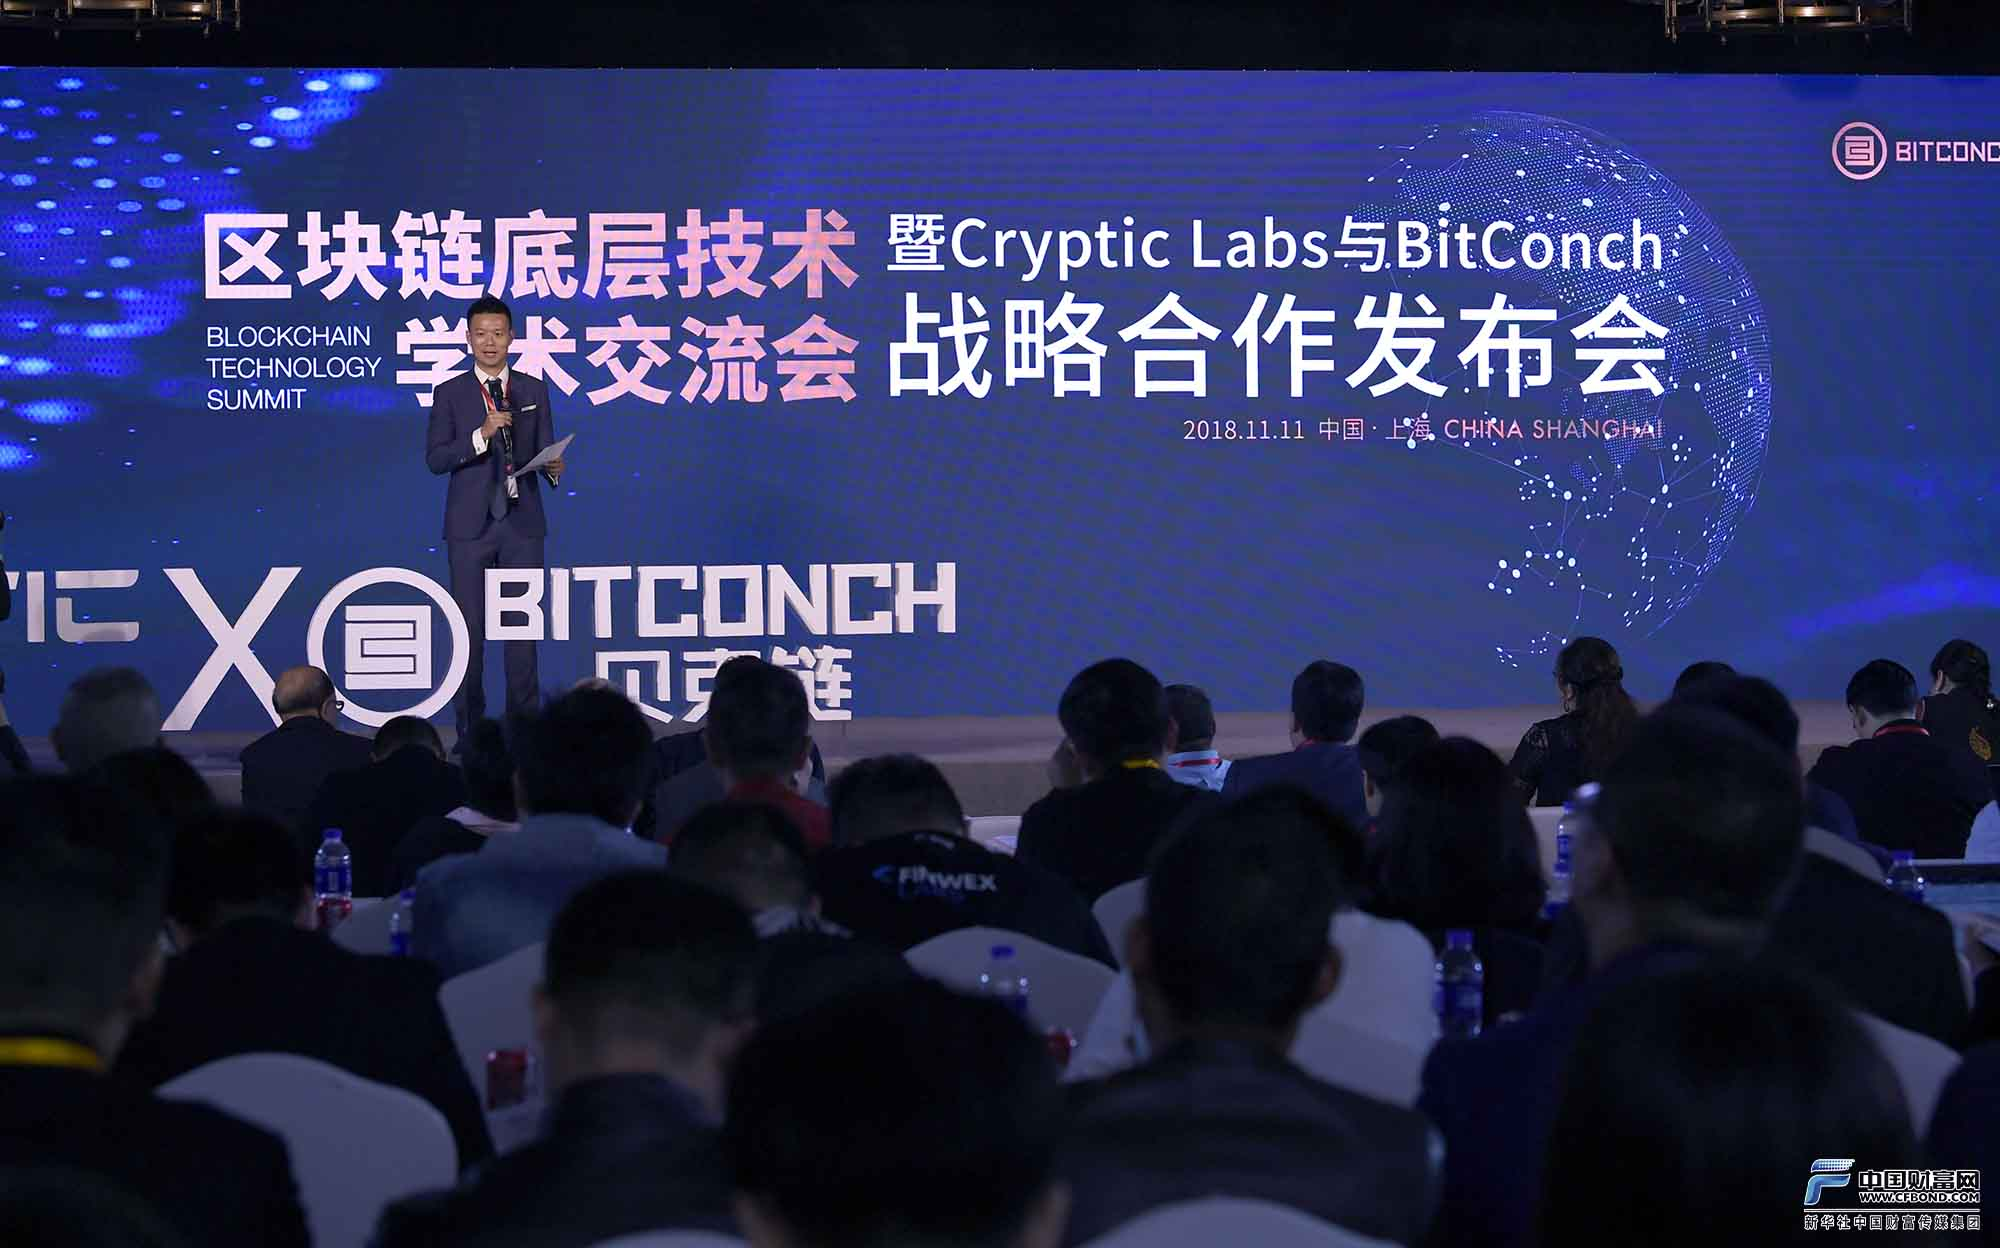 Cryptic Labs亚太区总经理陈超先生介绍